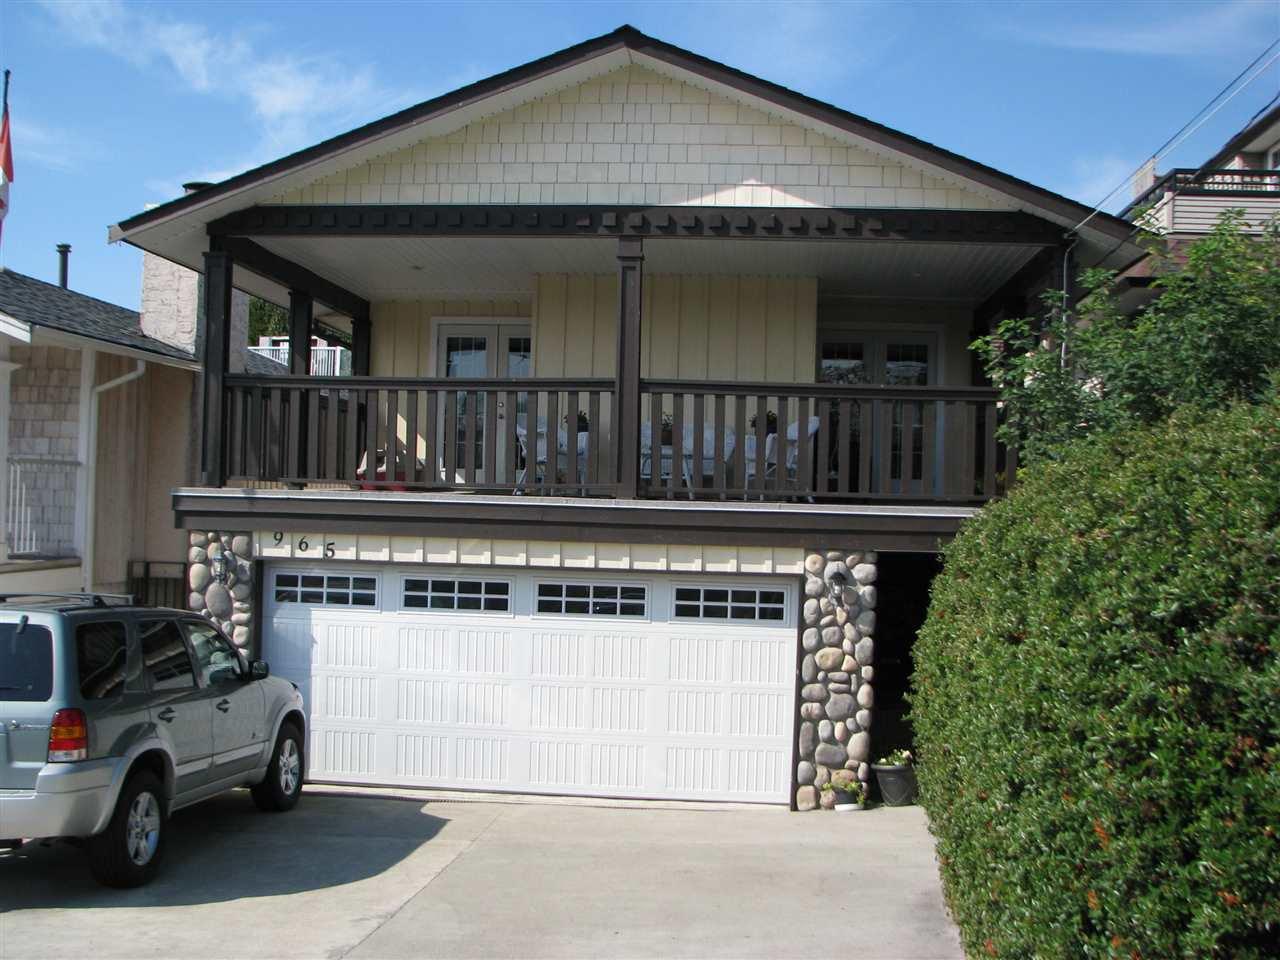 Main Photo: 965 KEIL Street: White Rock House for sale (South Surrey White Rock)  : MLS®# R2206346